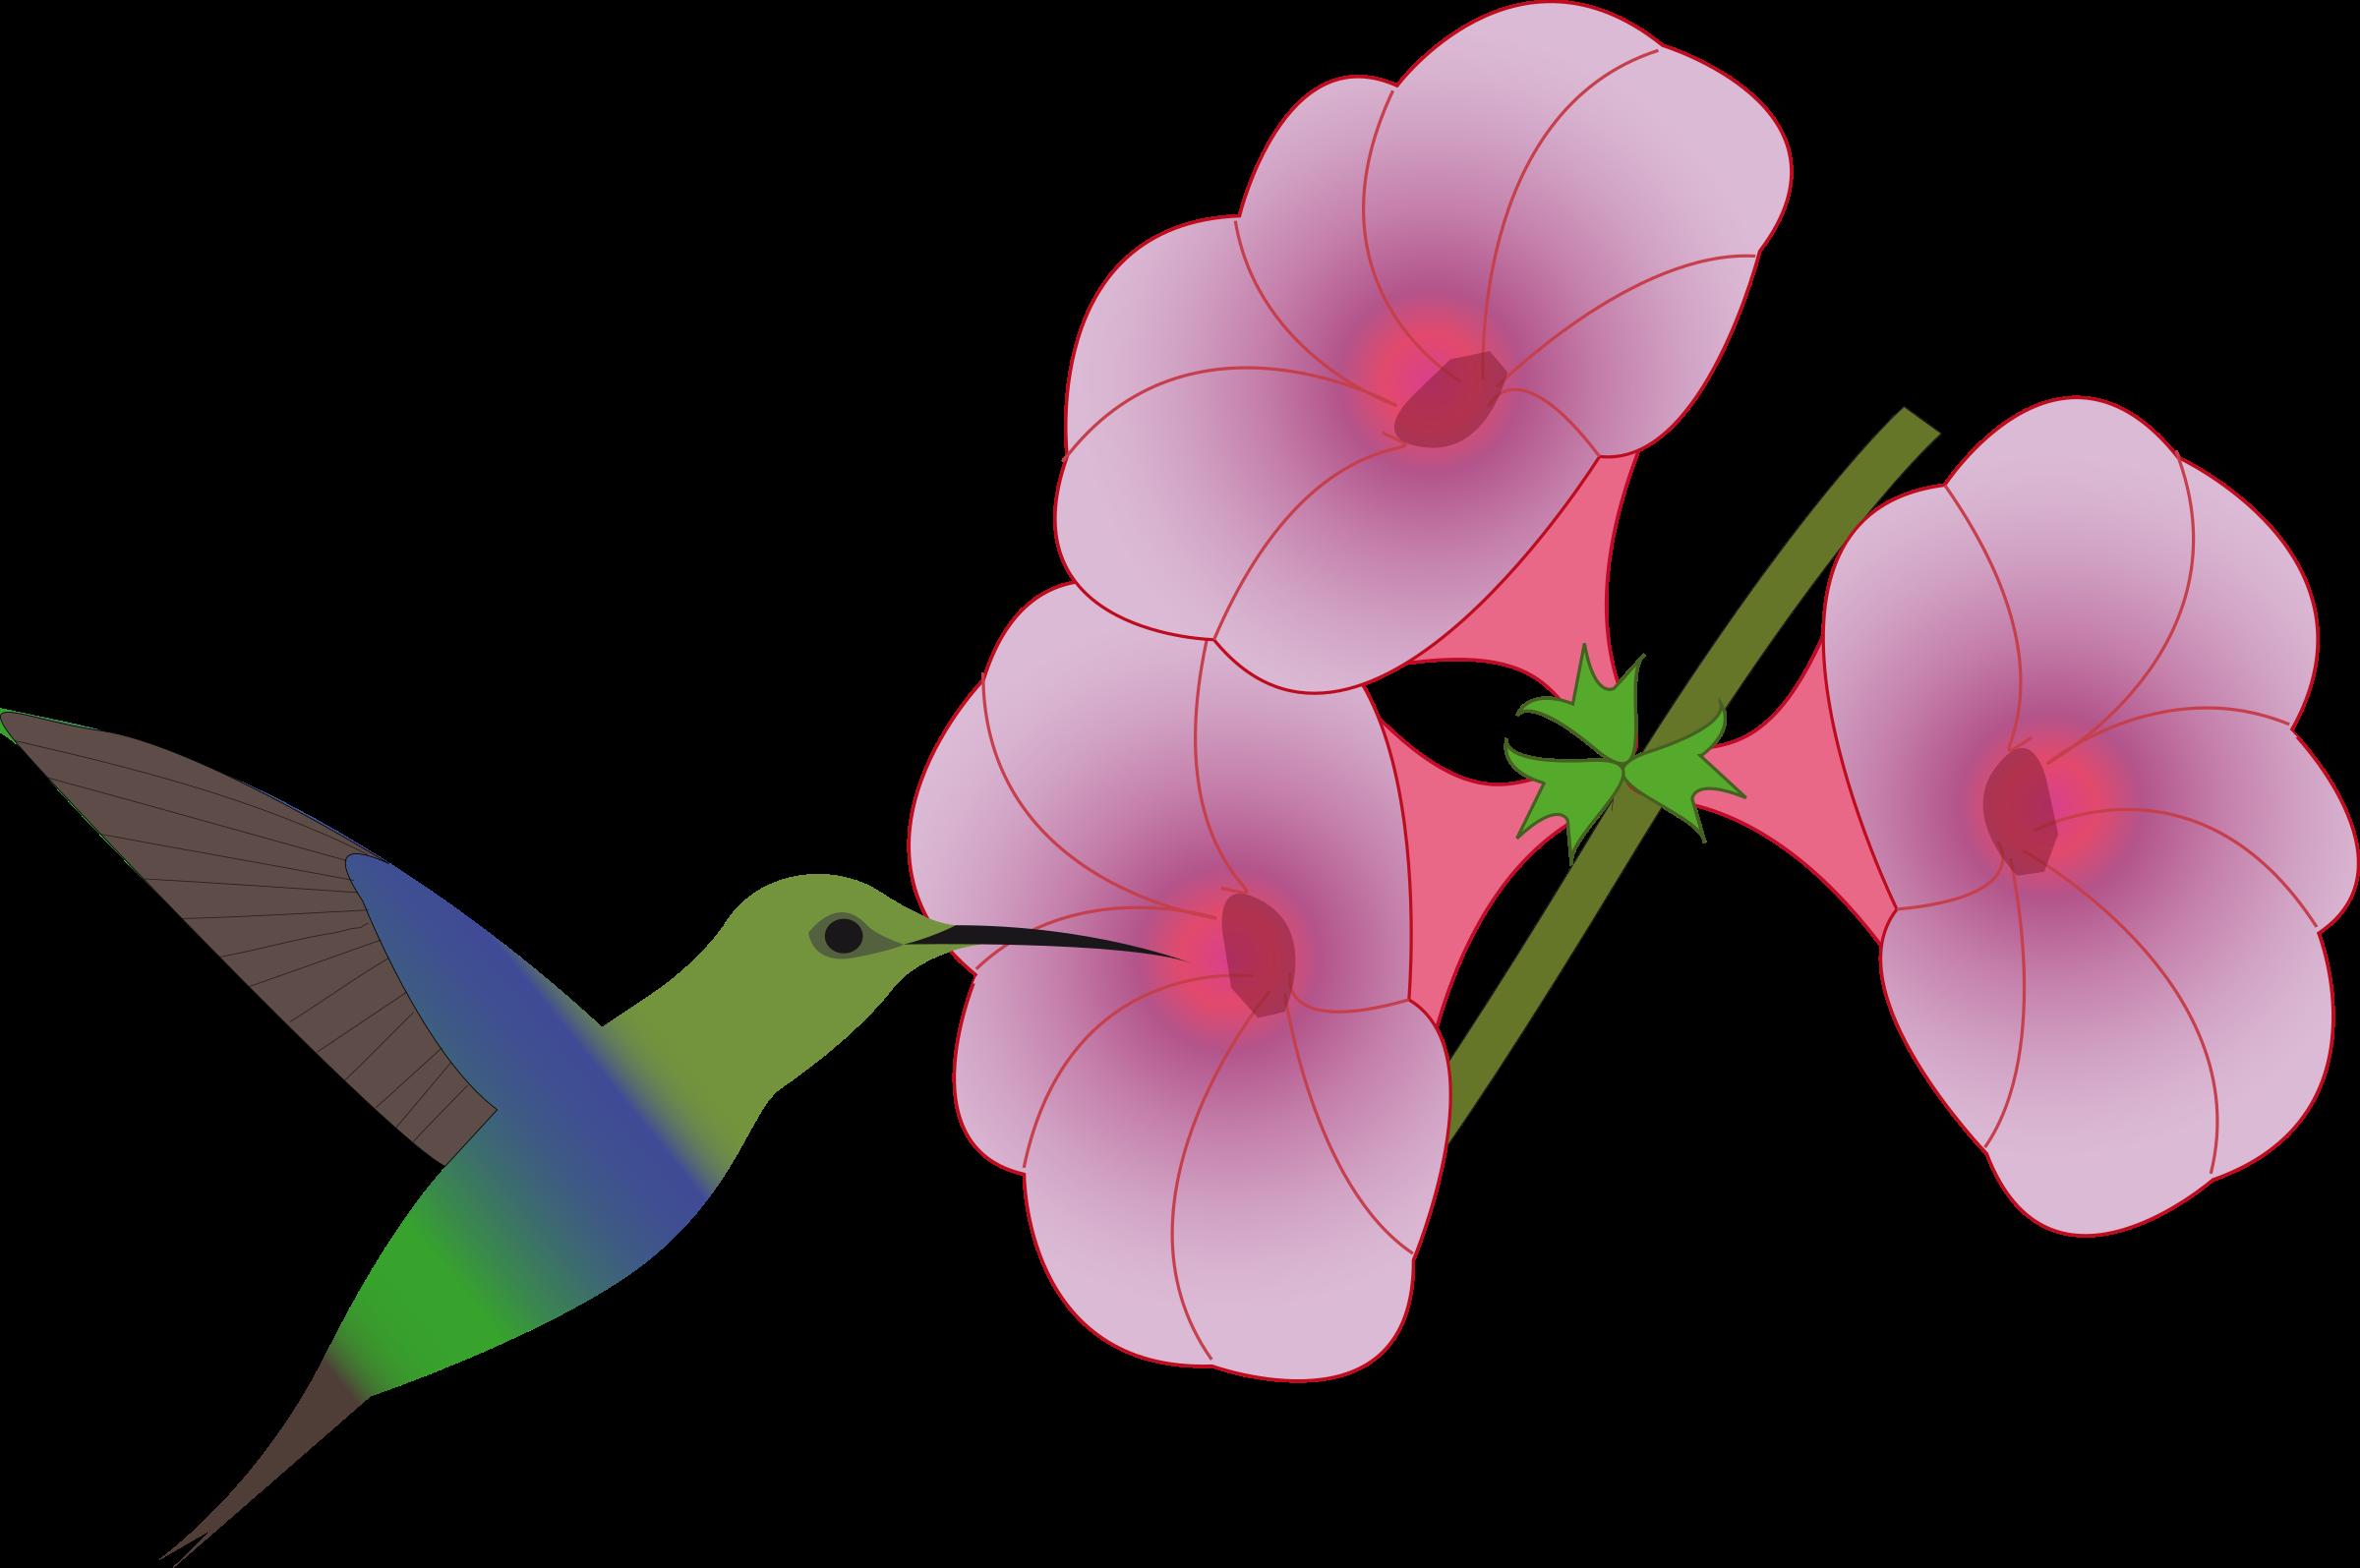 2400x1595 Hummingbird Clip Art. Hummingbird Stencil With Hummingbird Clip